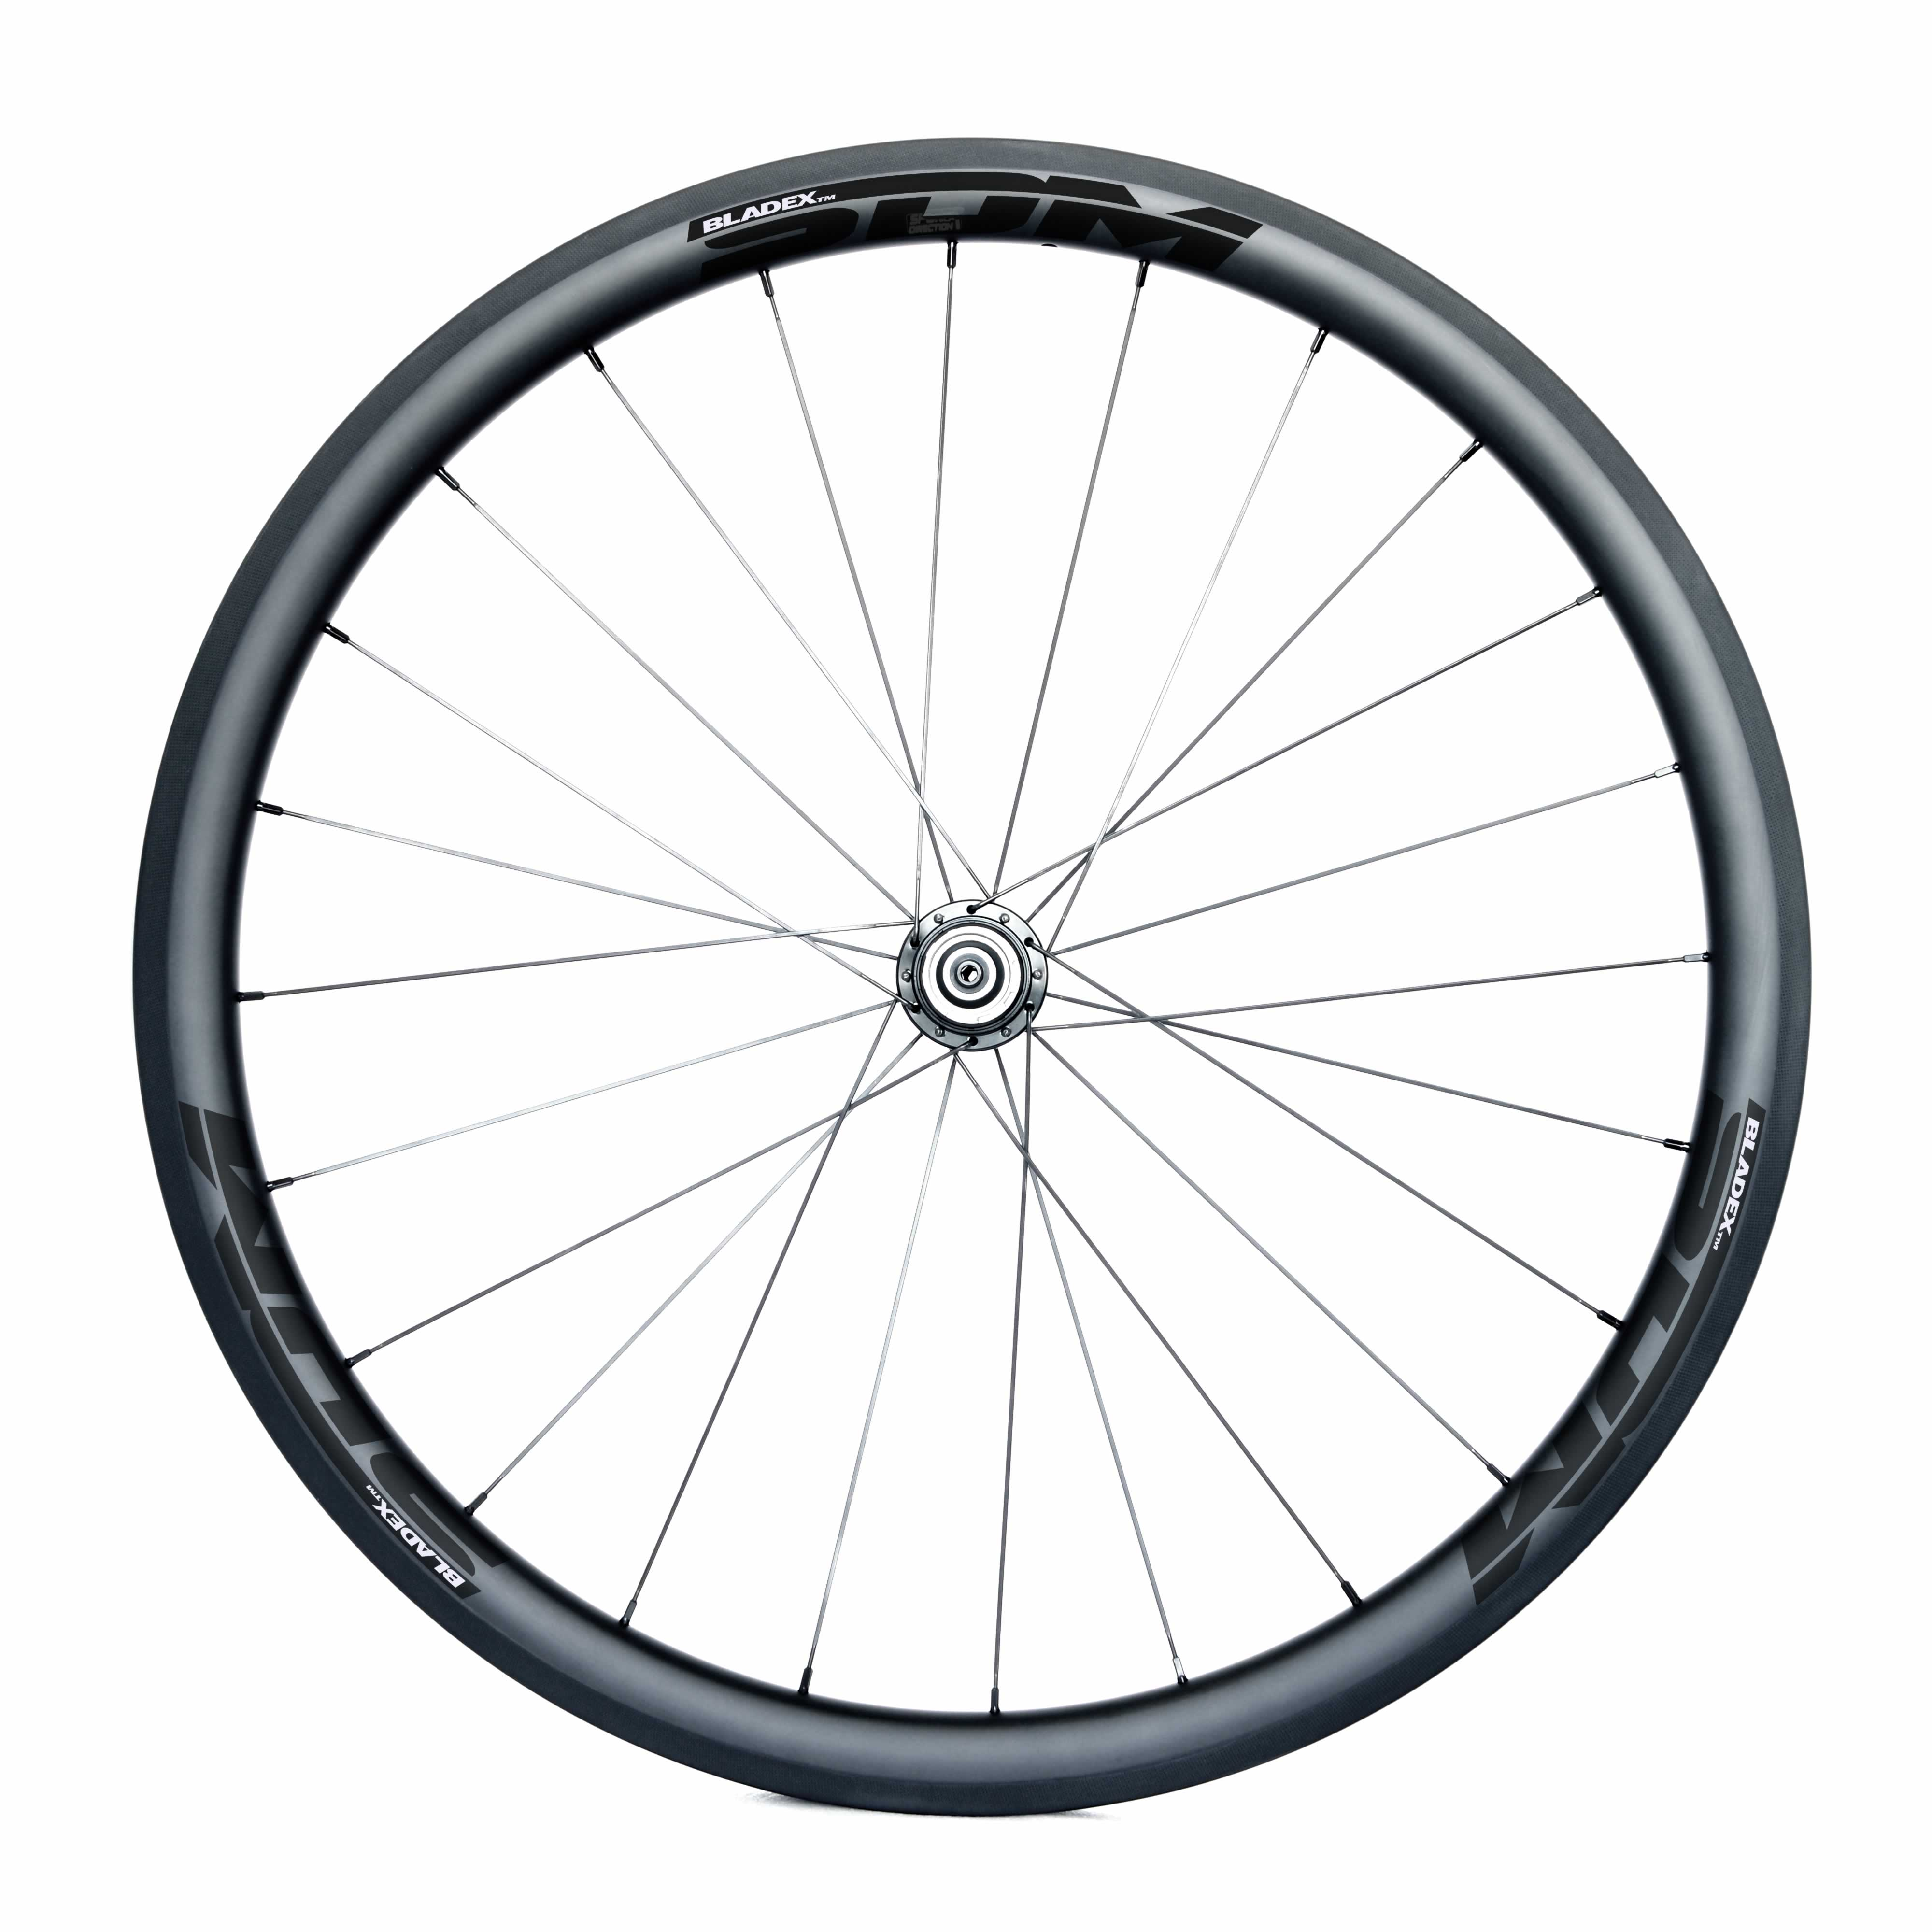 SDM 4 Carbon Road Bike Rear Wheel UD Matte SDM Black Logo